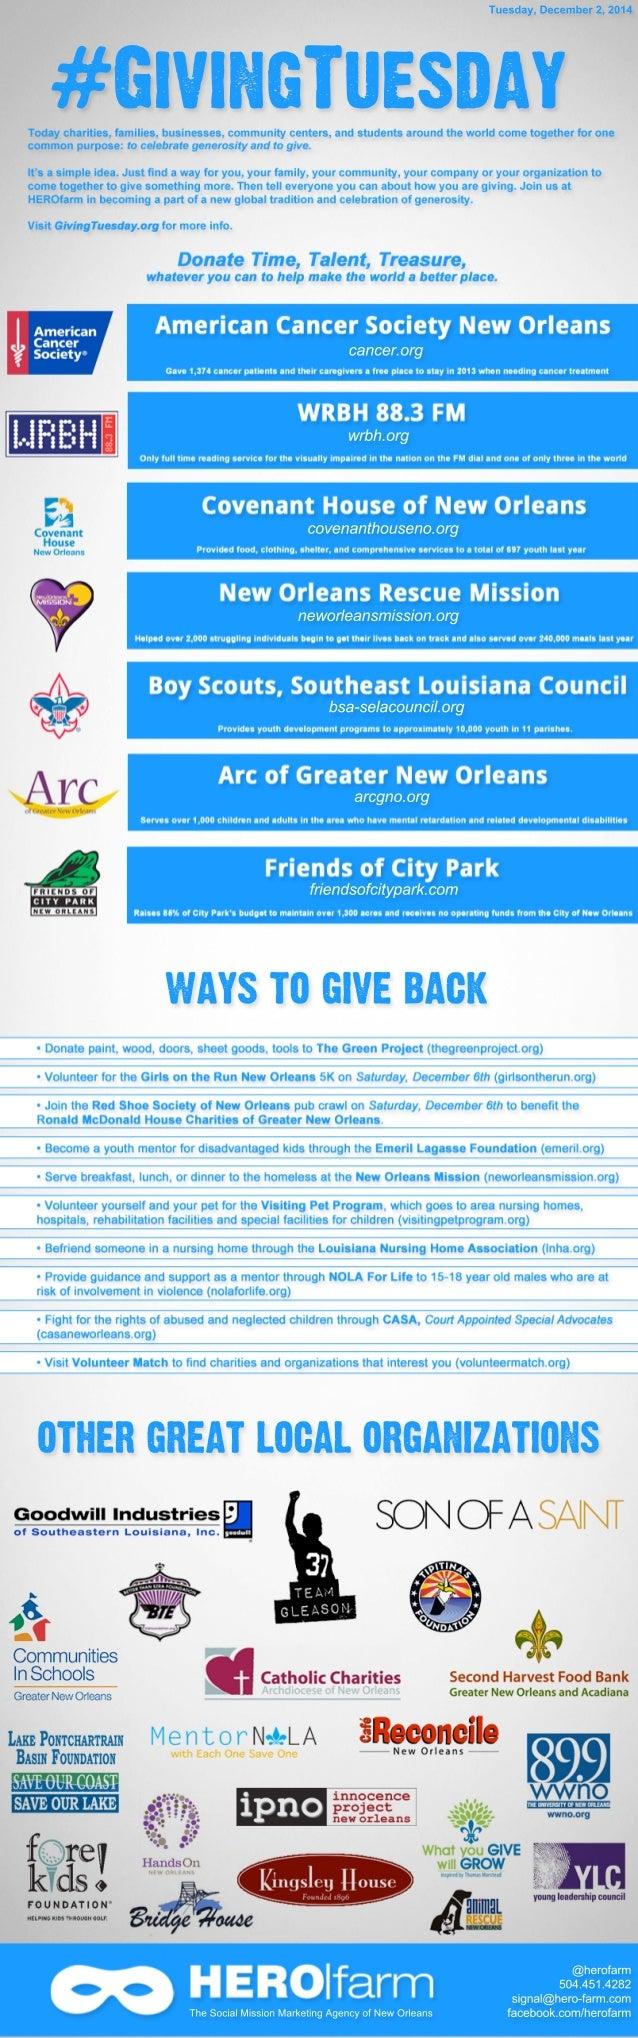 Tuesday, December 2, 2014  @herofarm  504.451.4282  cancer.org  wrbh.org  covenanthouseno.org  neworleansmission.org  bsa-...